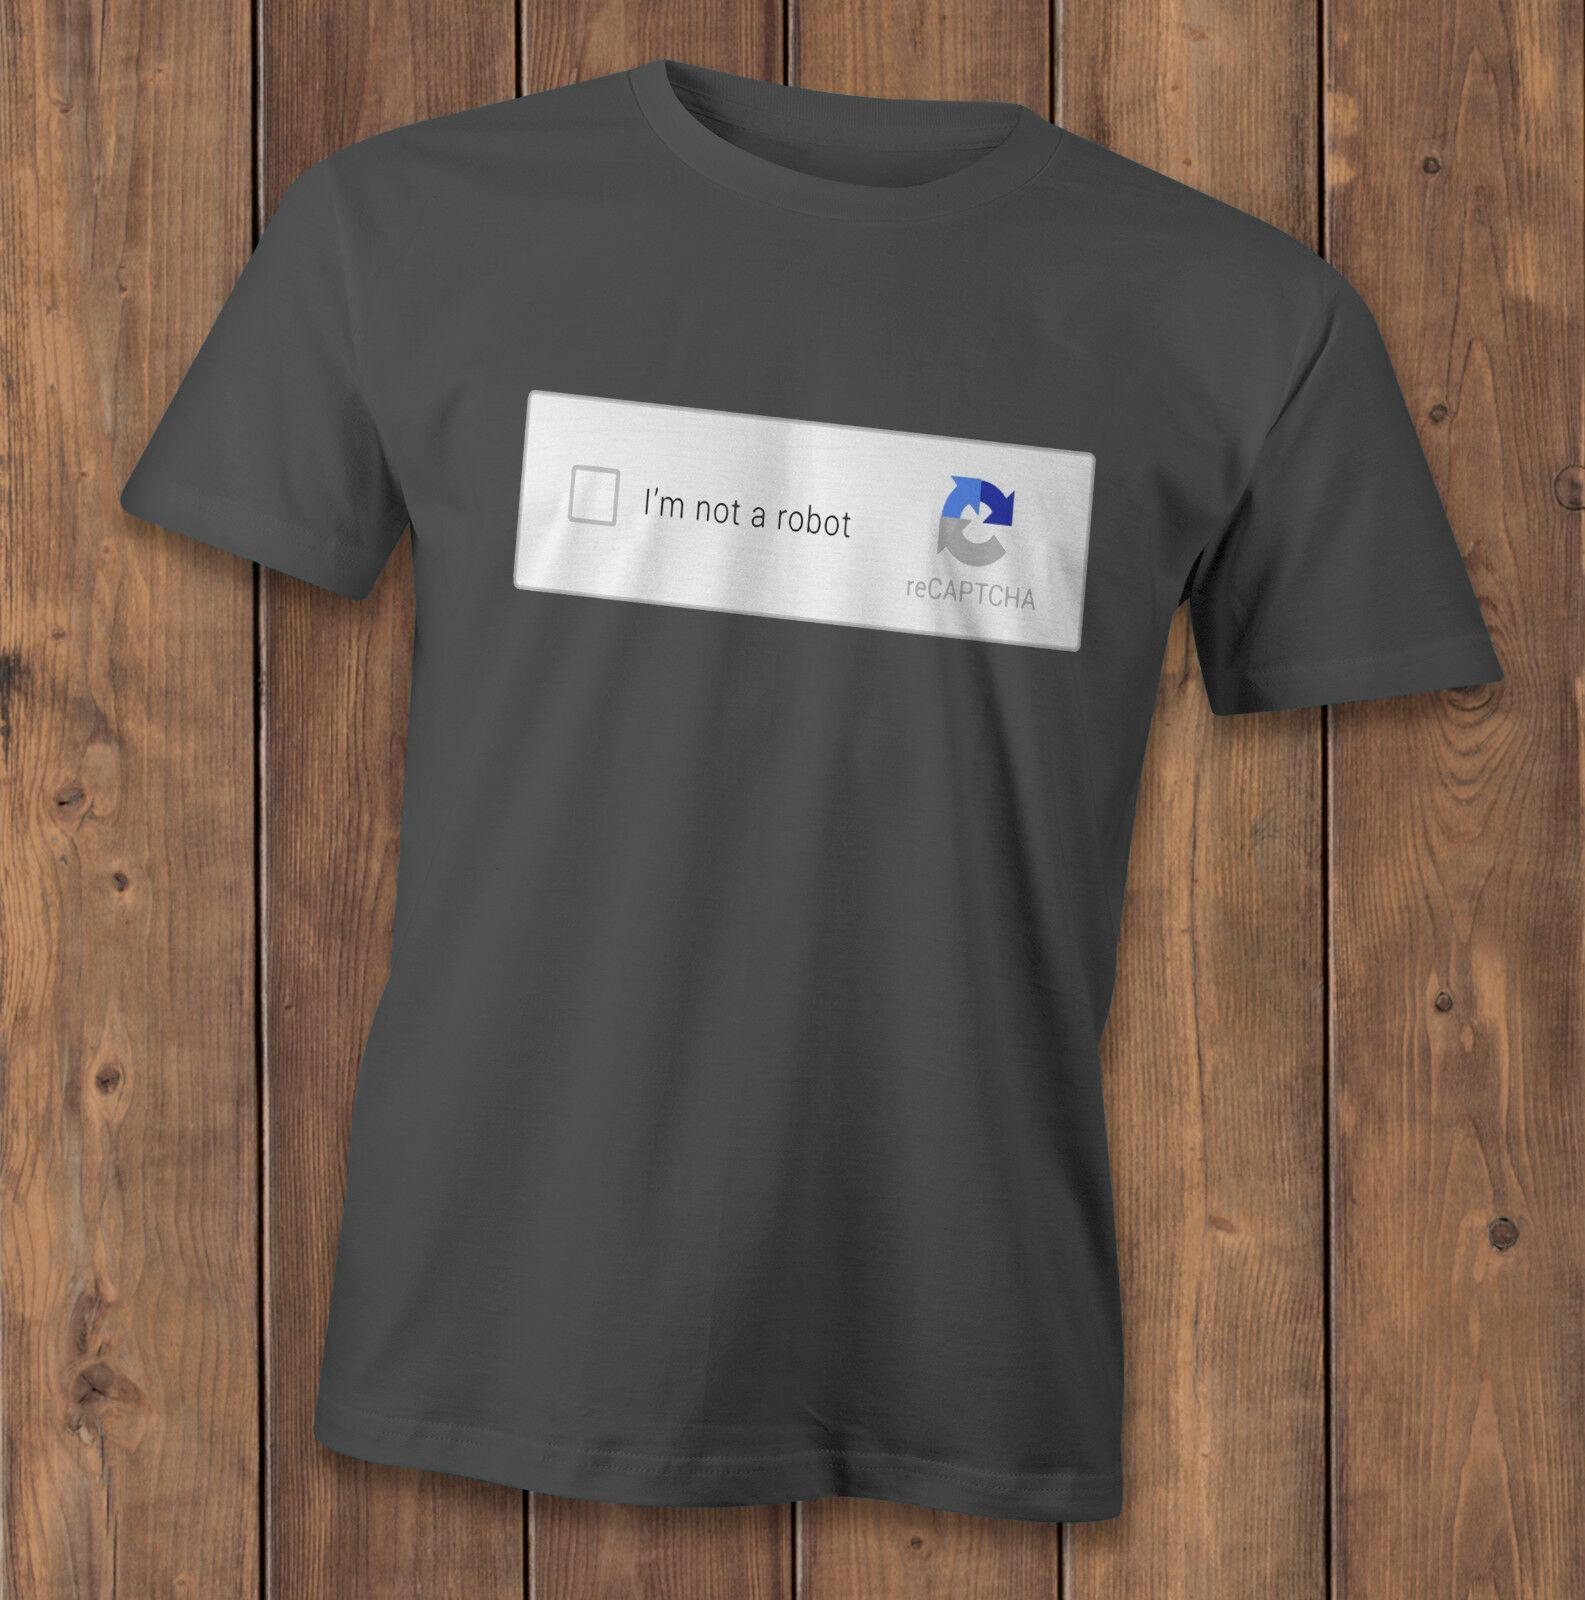 Yo no soy un robot camiseta captcha tee internet hackers camiseta geek programadores